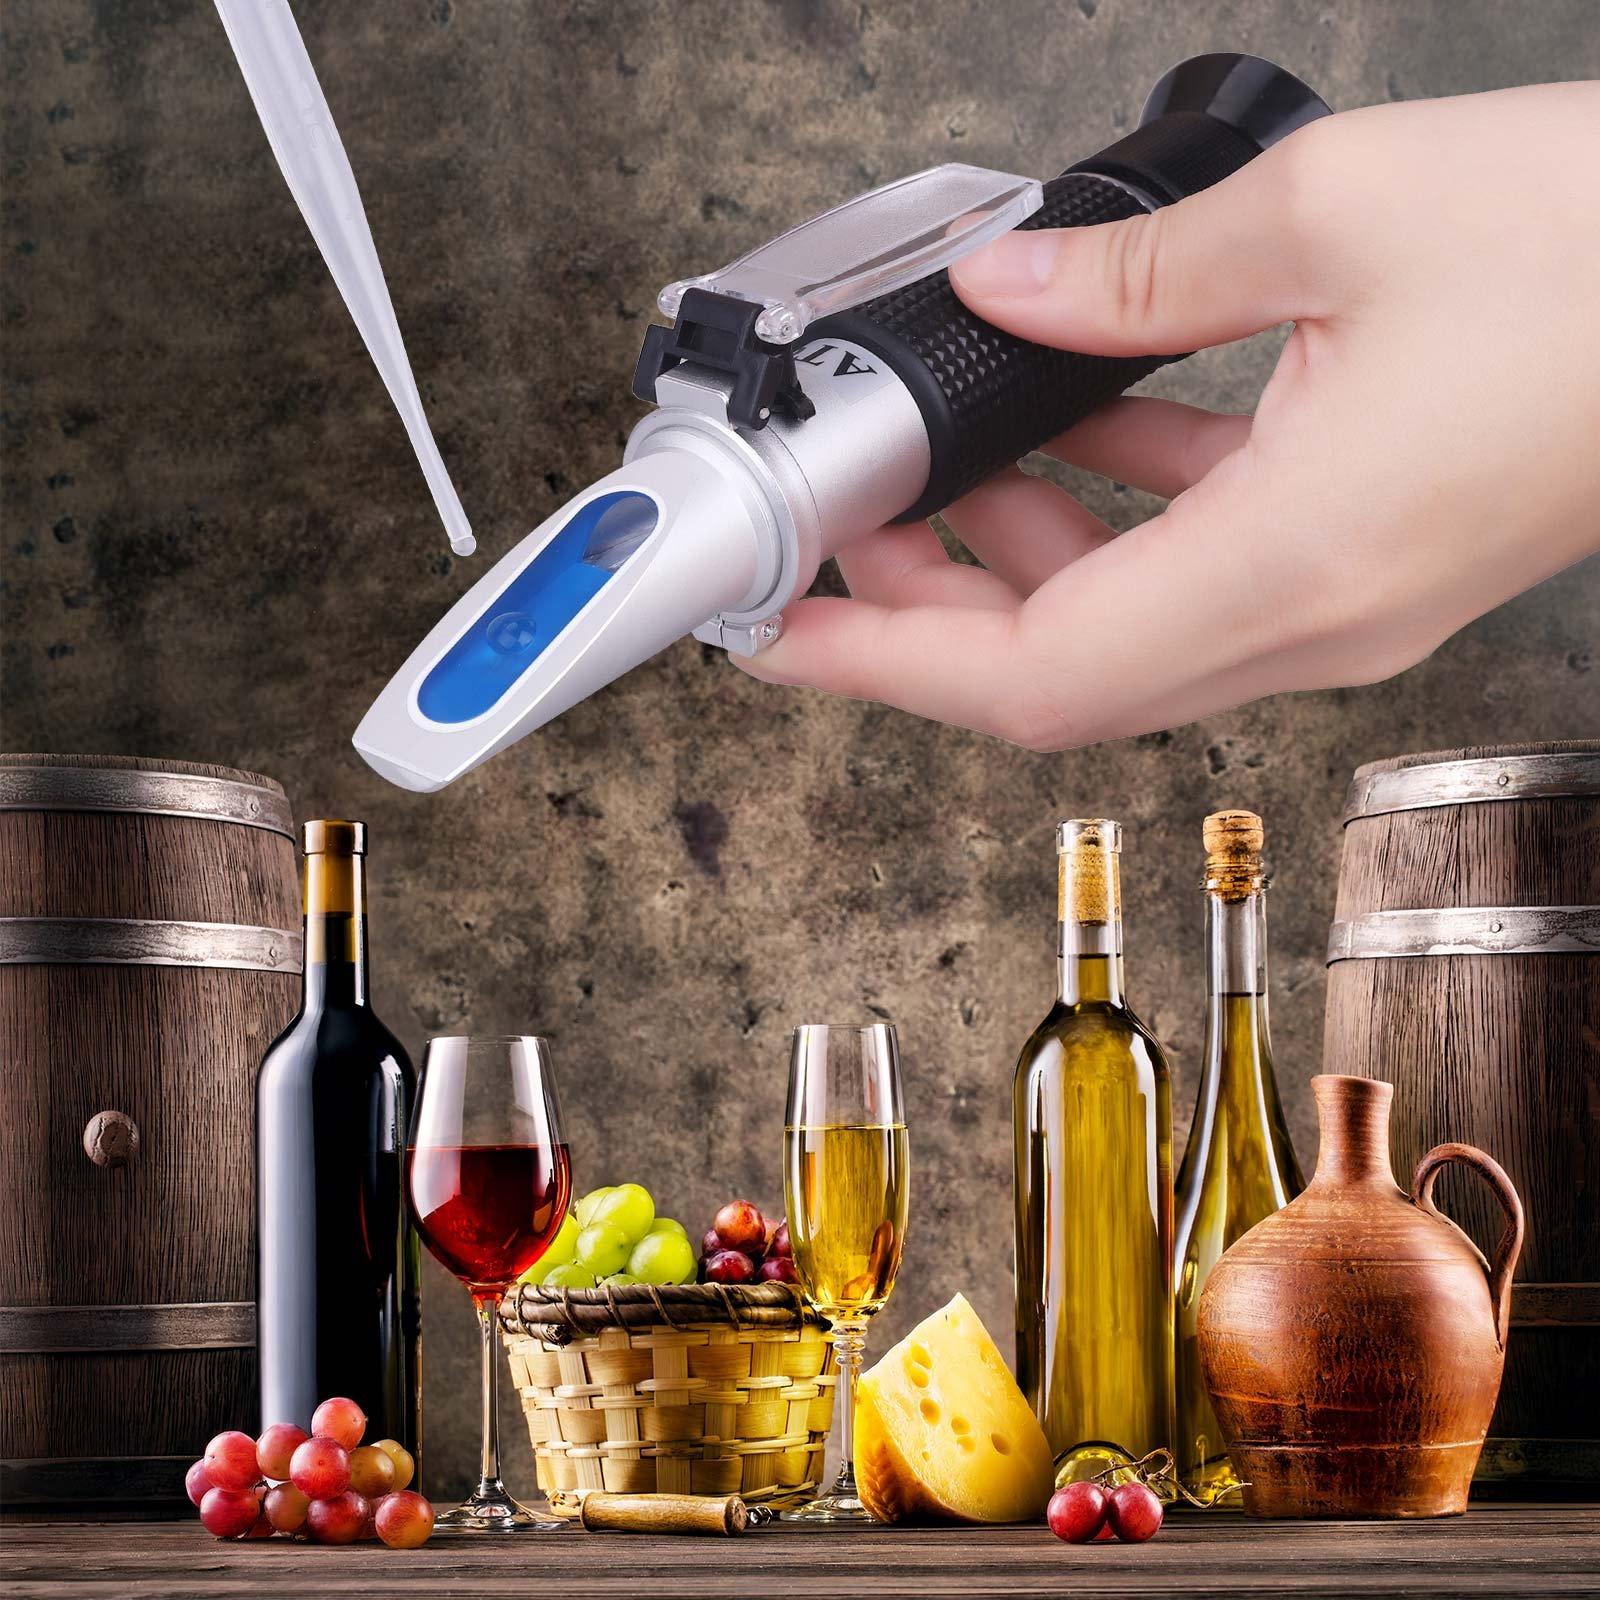 Tiaoyeer Brix Refractometer with ATC Digital Handheld Refractometer for Beer Wine Fruit Sugar, Dual Scale-Specific Gravity 1.000-1.130 and Brix 0-32% (Black) by Tiaoyeer (Image #4)